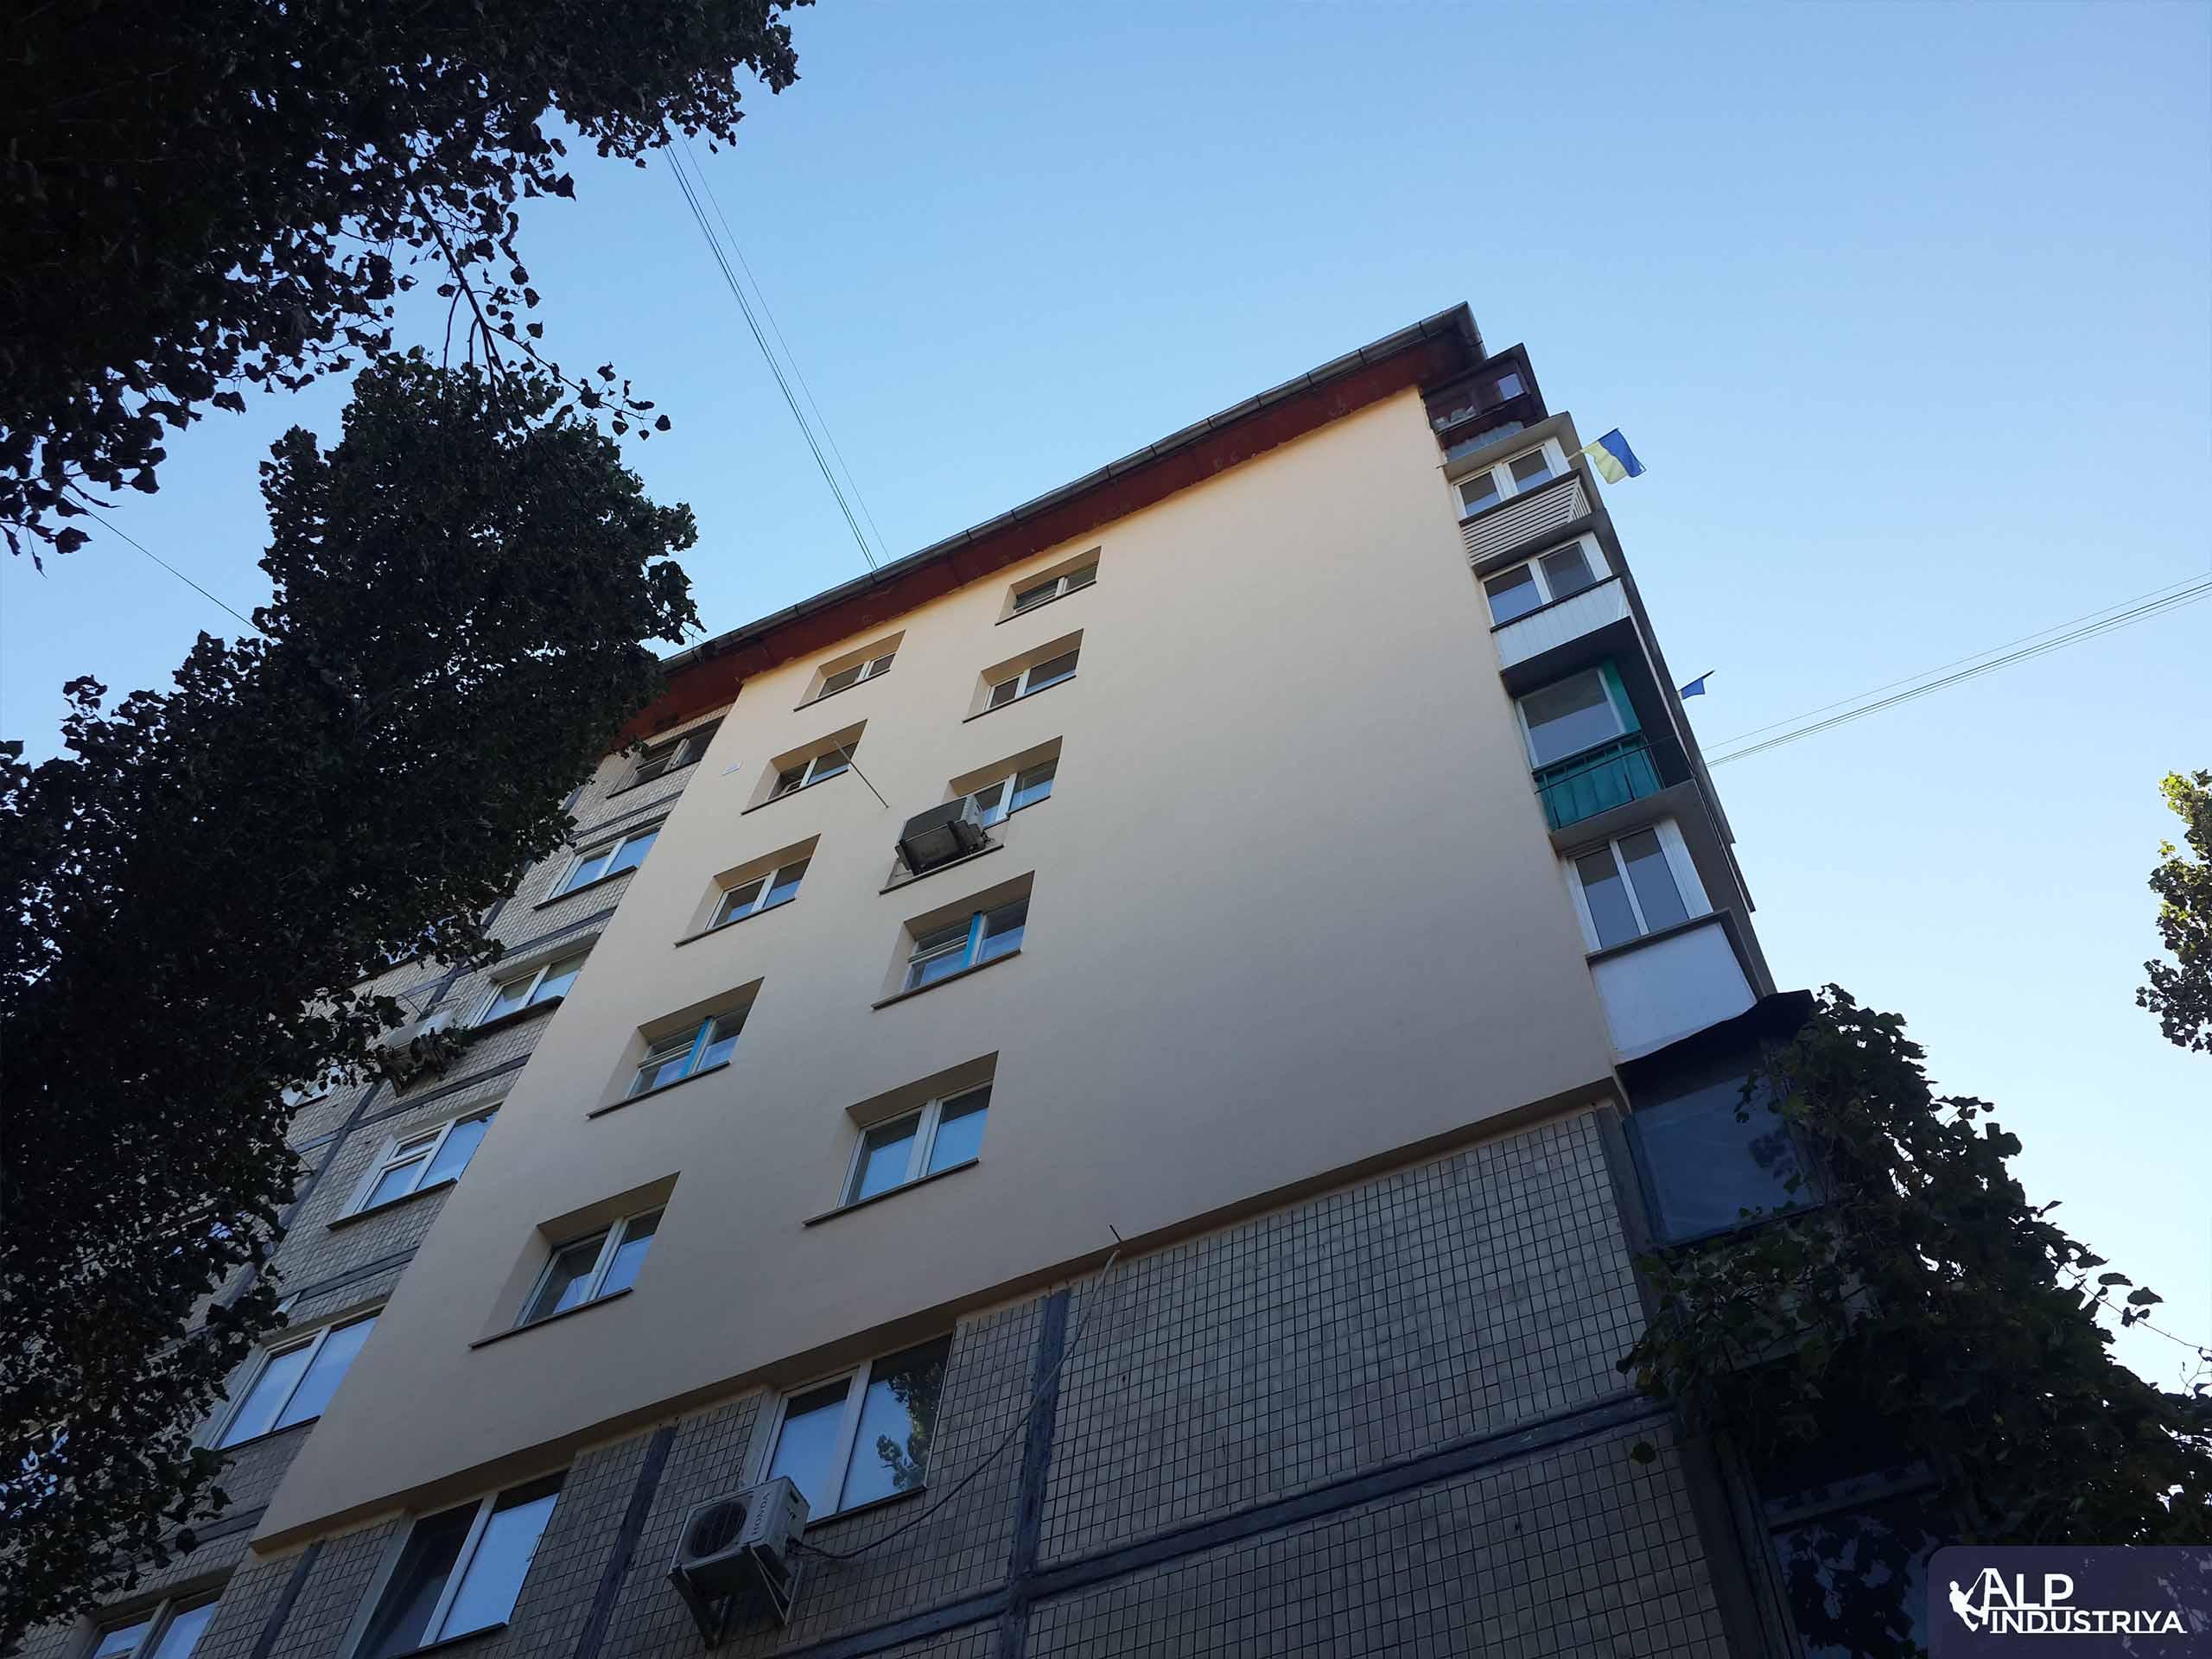 Теплоизоляция стен и углов многоквартирного дома промальпами-6